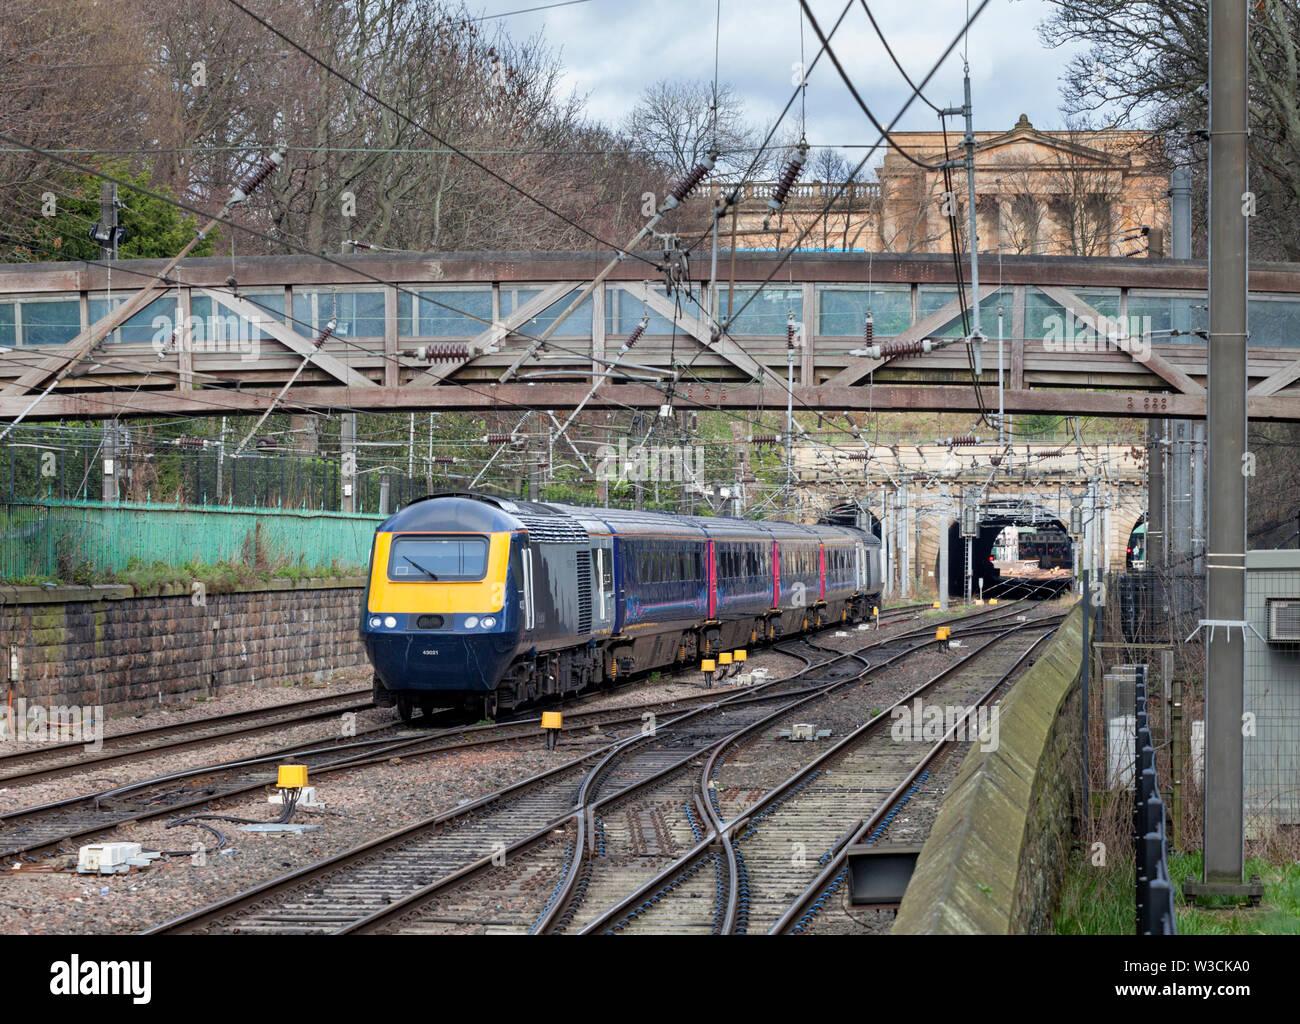 20/03/2019 Princes Street gardens, Edinburgh 43021  (+43145) 1530 Edinburgh to Aberdeen - Stock Image